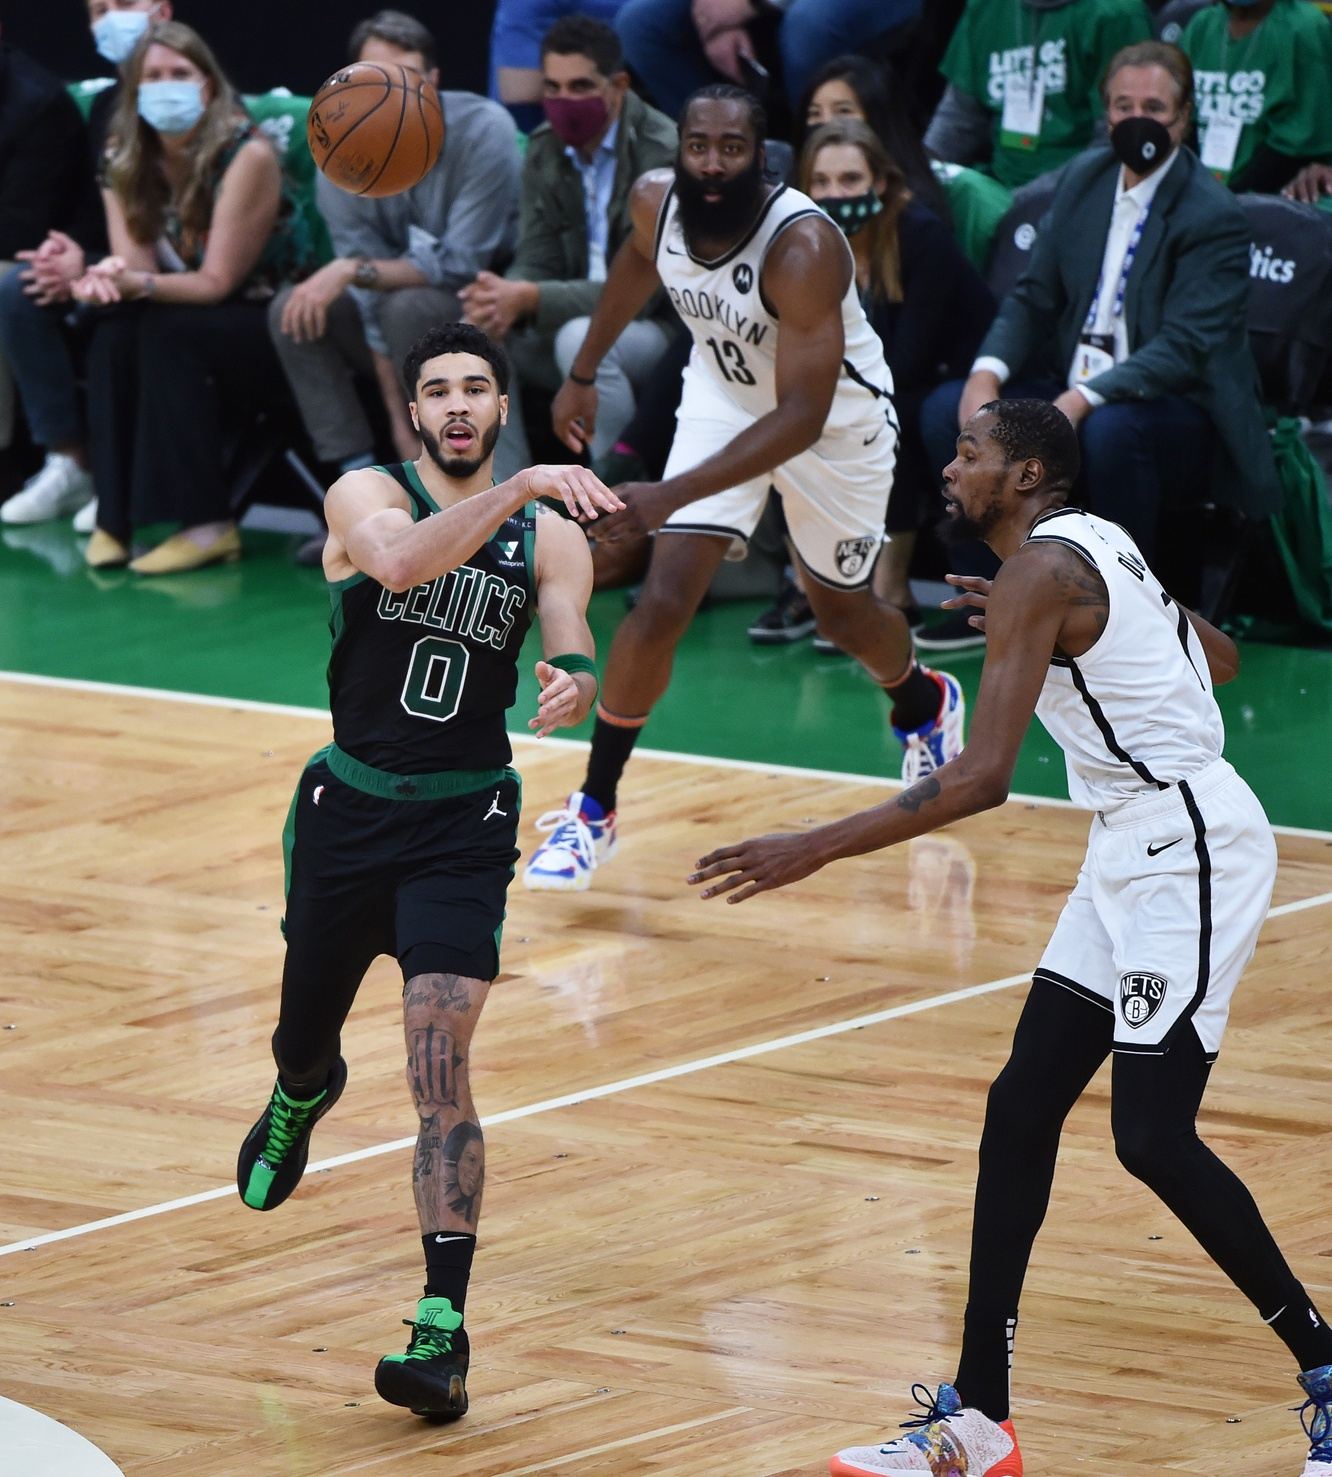 Rapid Recap: Tatum's historic night and team-wide heart propel Celtics to Game 3 victory